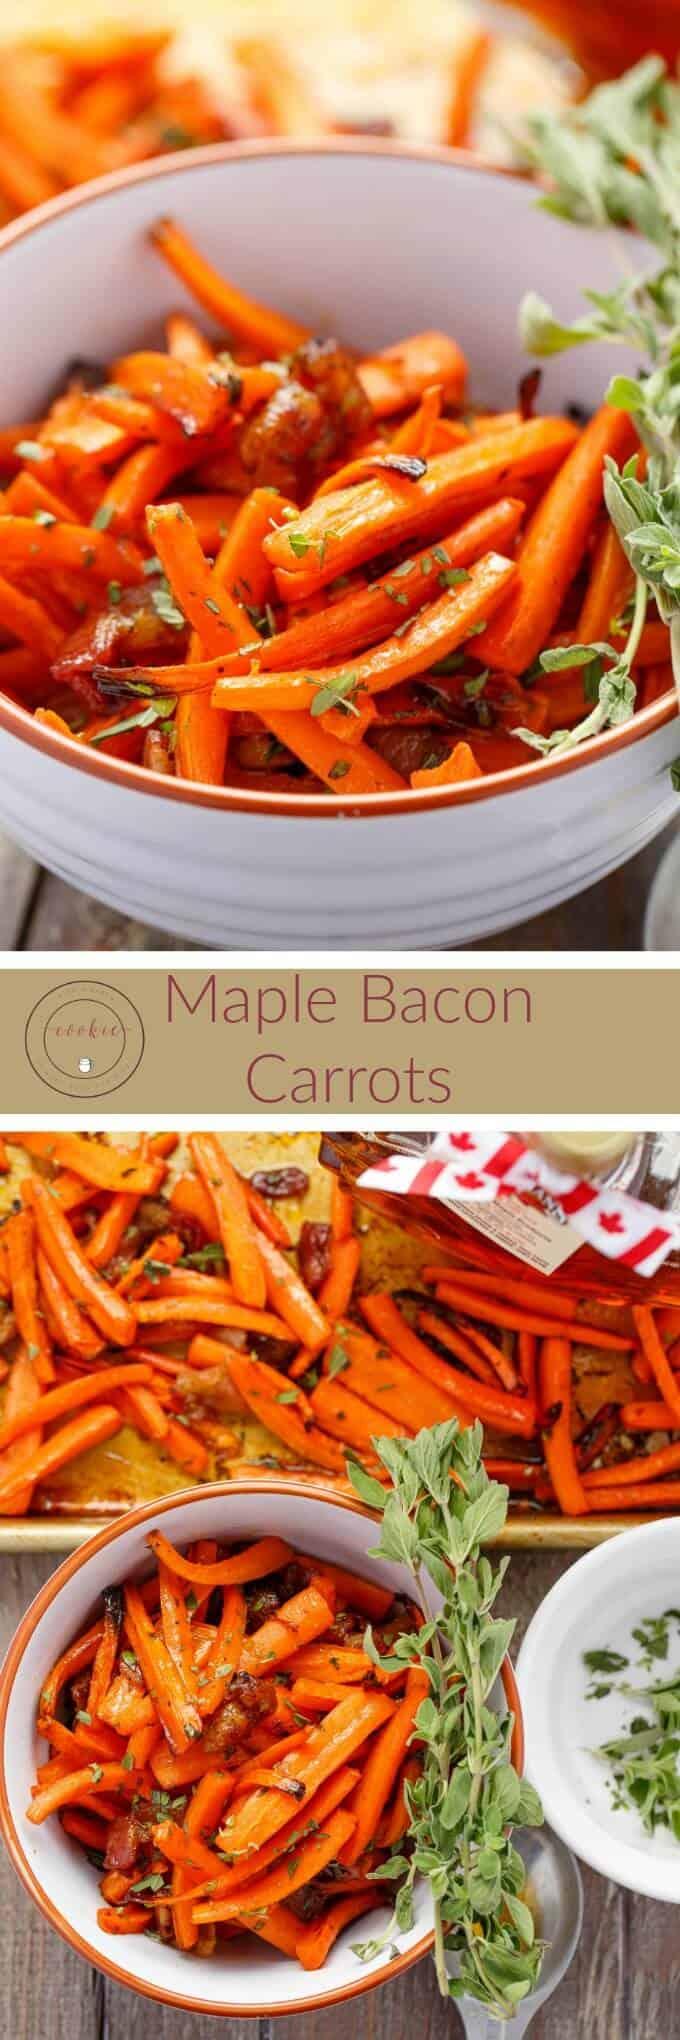 maple-bacon-carrots